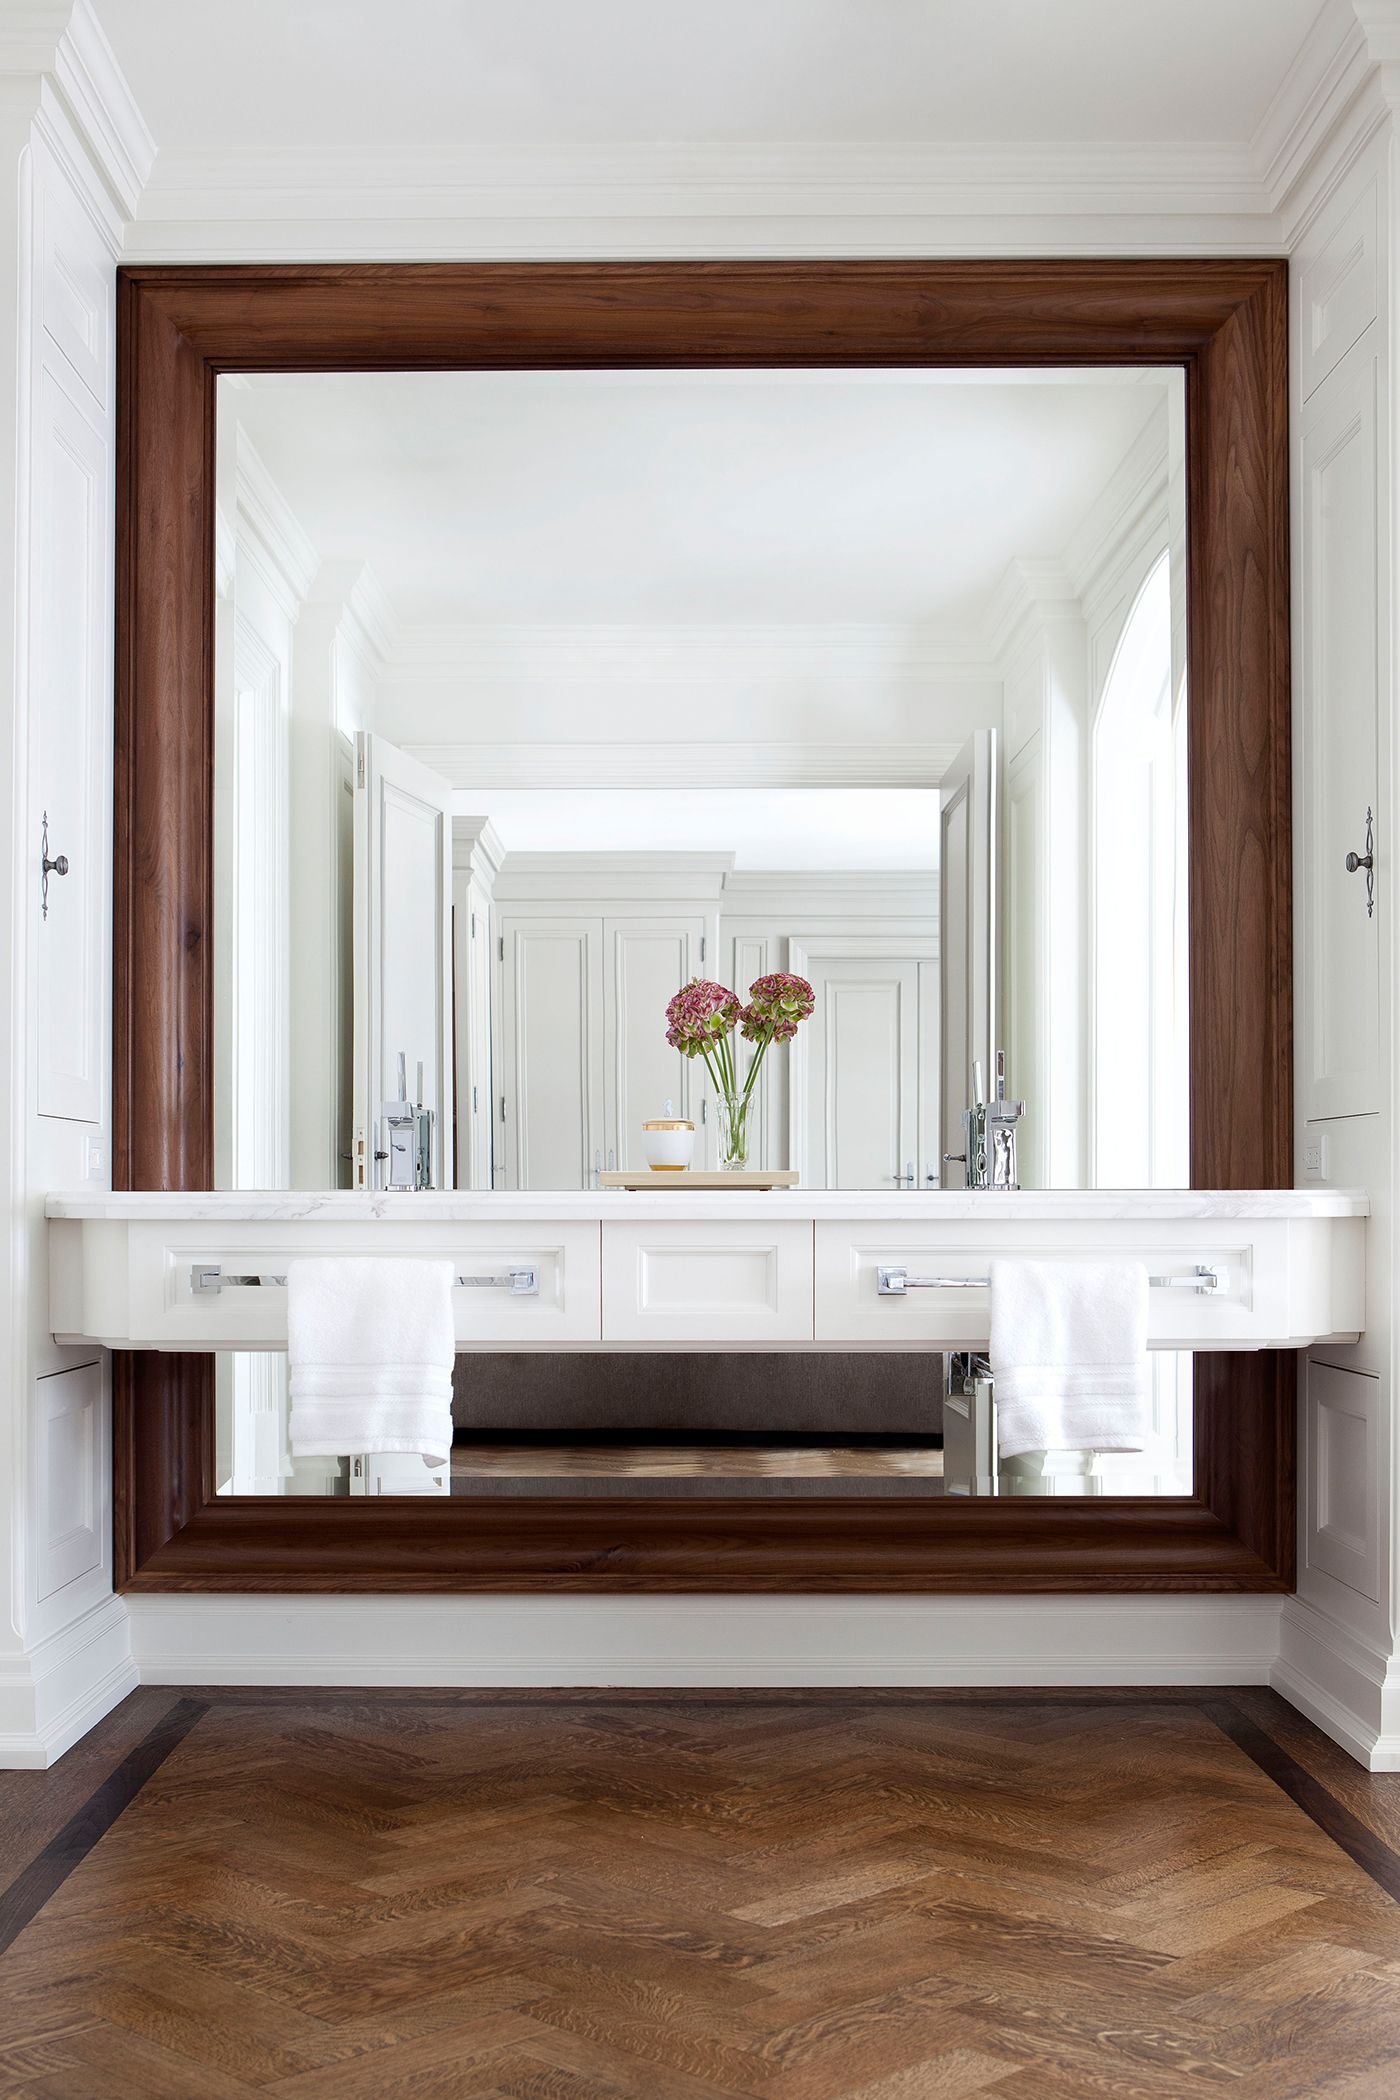 classic master bathroom by julie charbonneau makelivinganart classic master bathroom by julie charbonneau makelivinganart